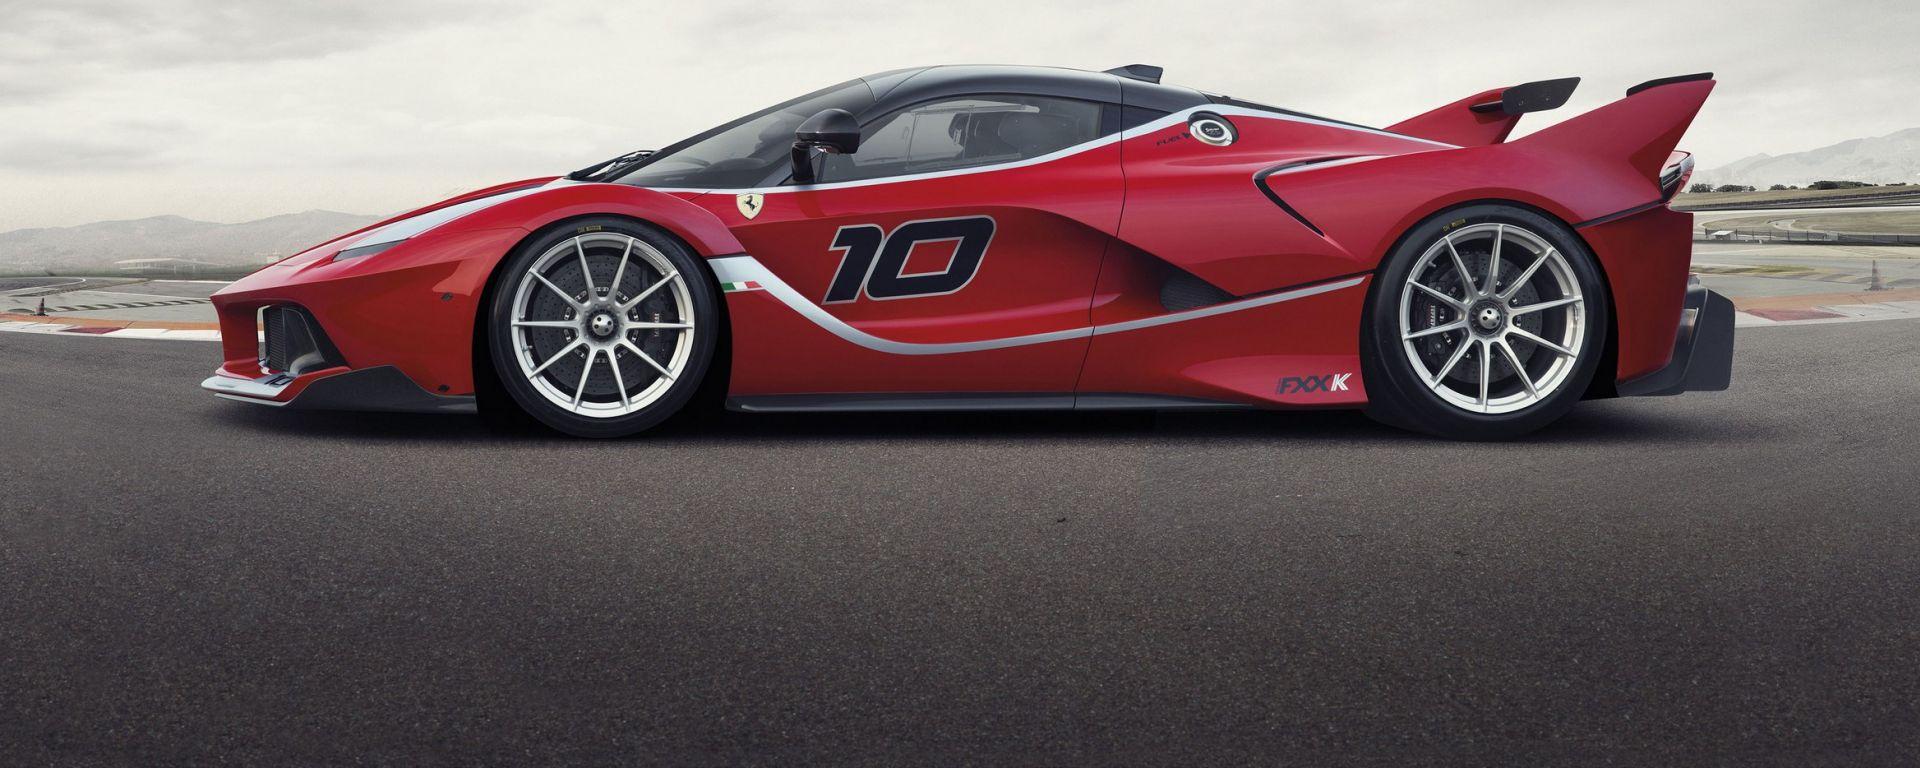 Ferrari FXX K: vista laterale